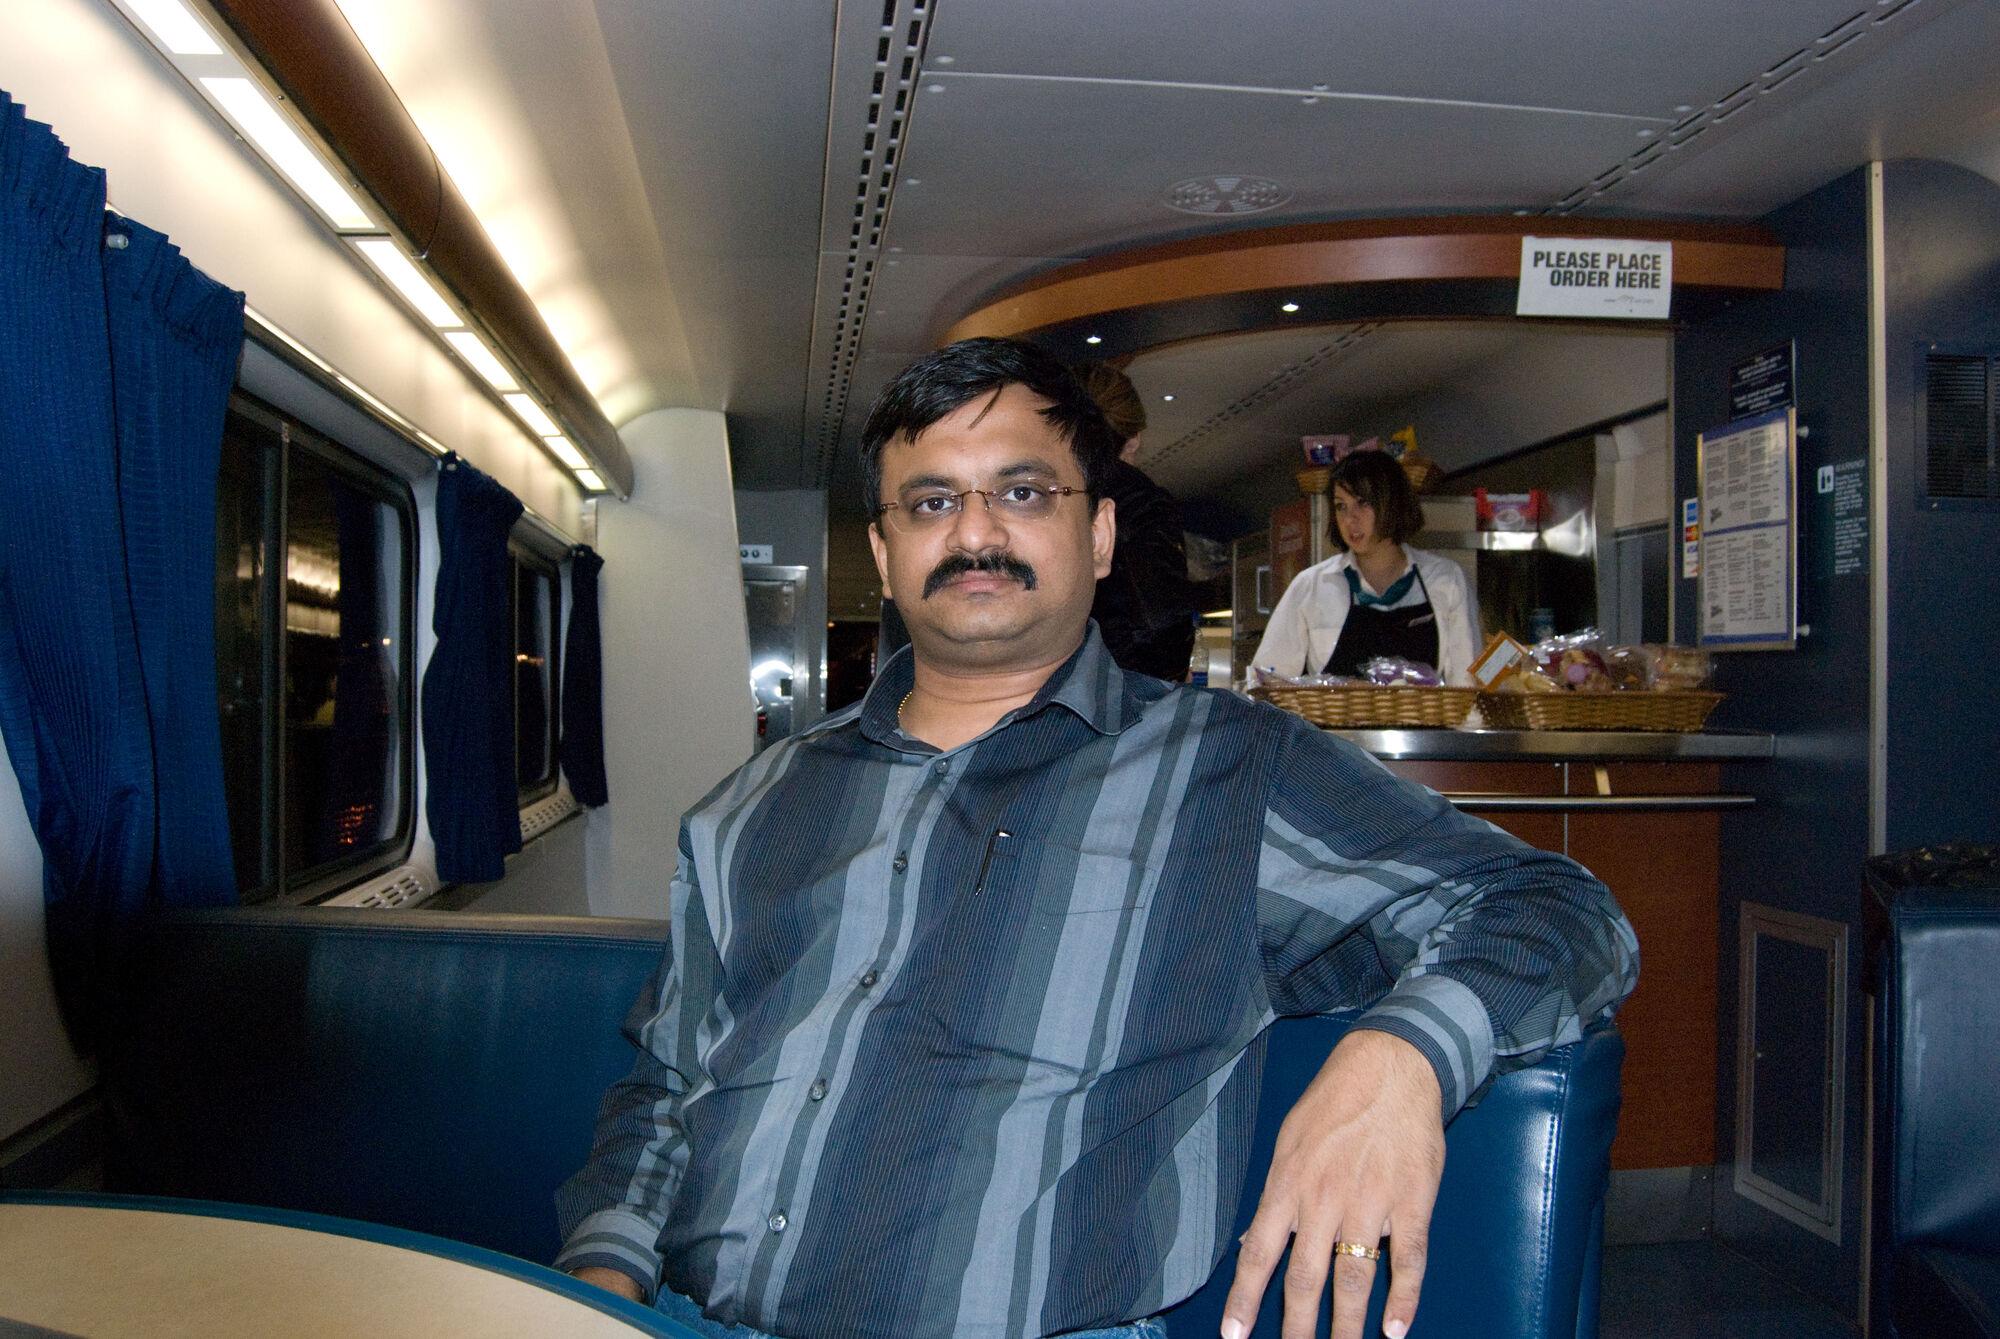 Amtrak Pantry